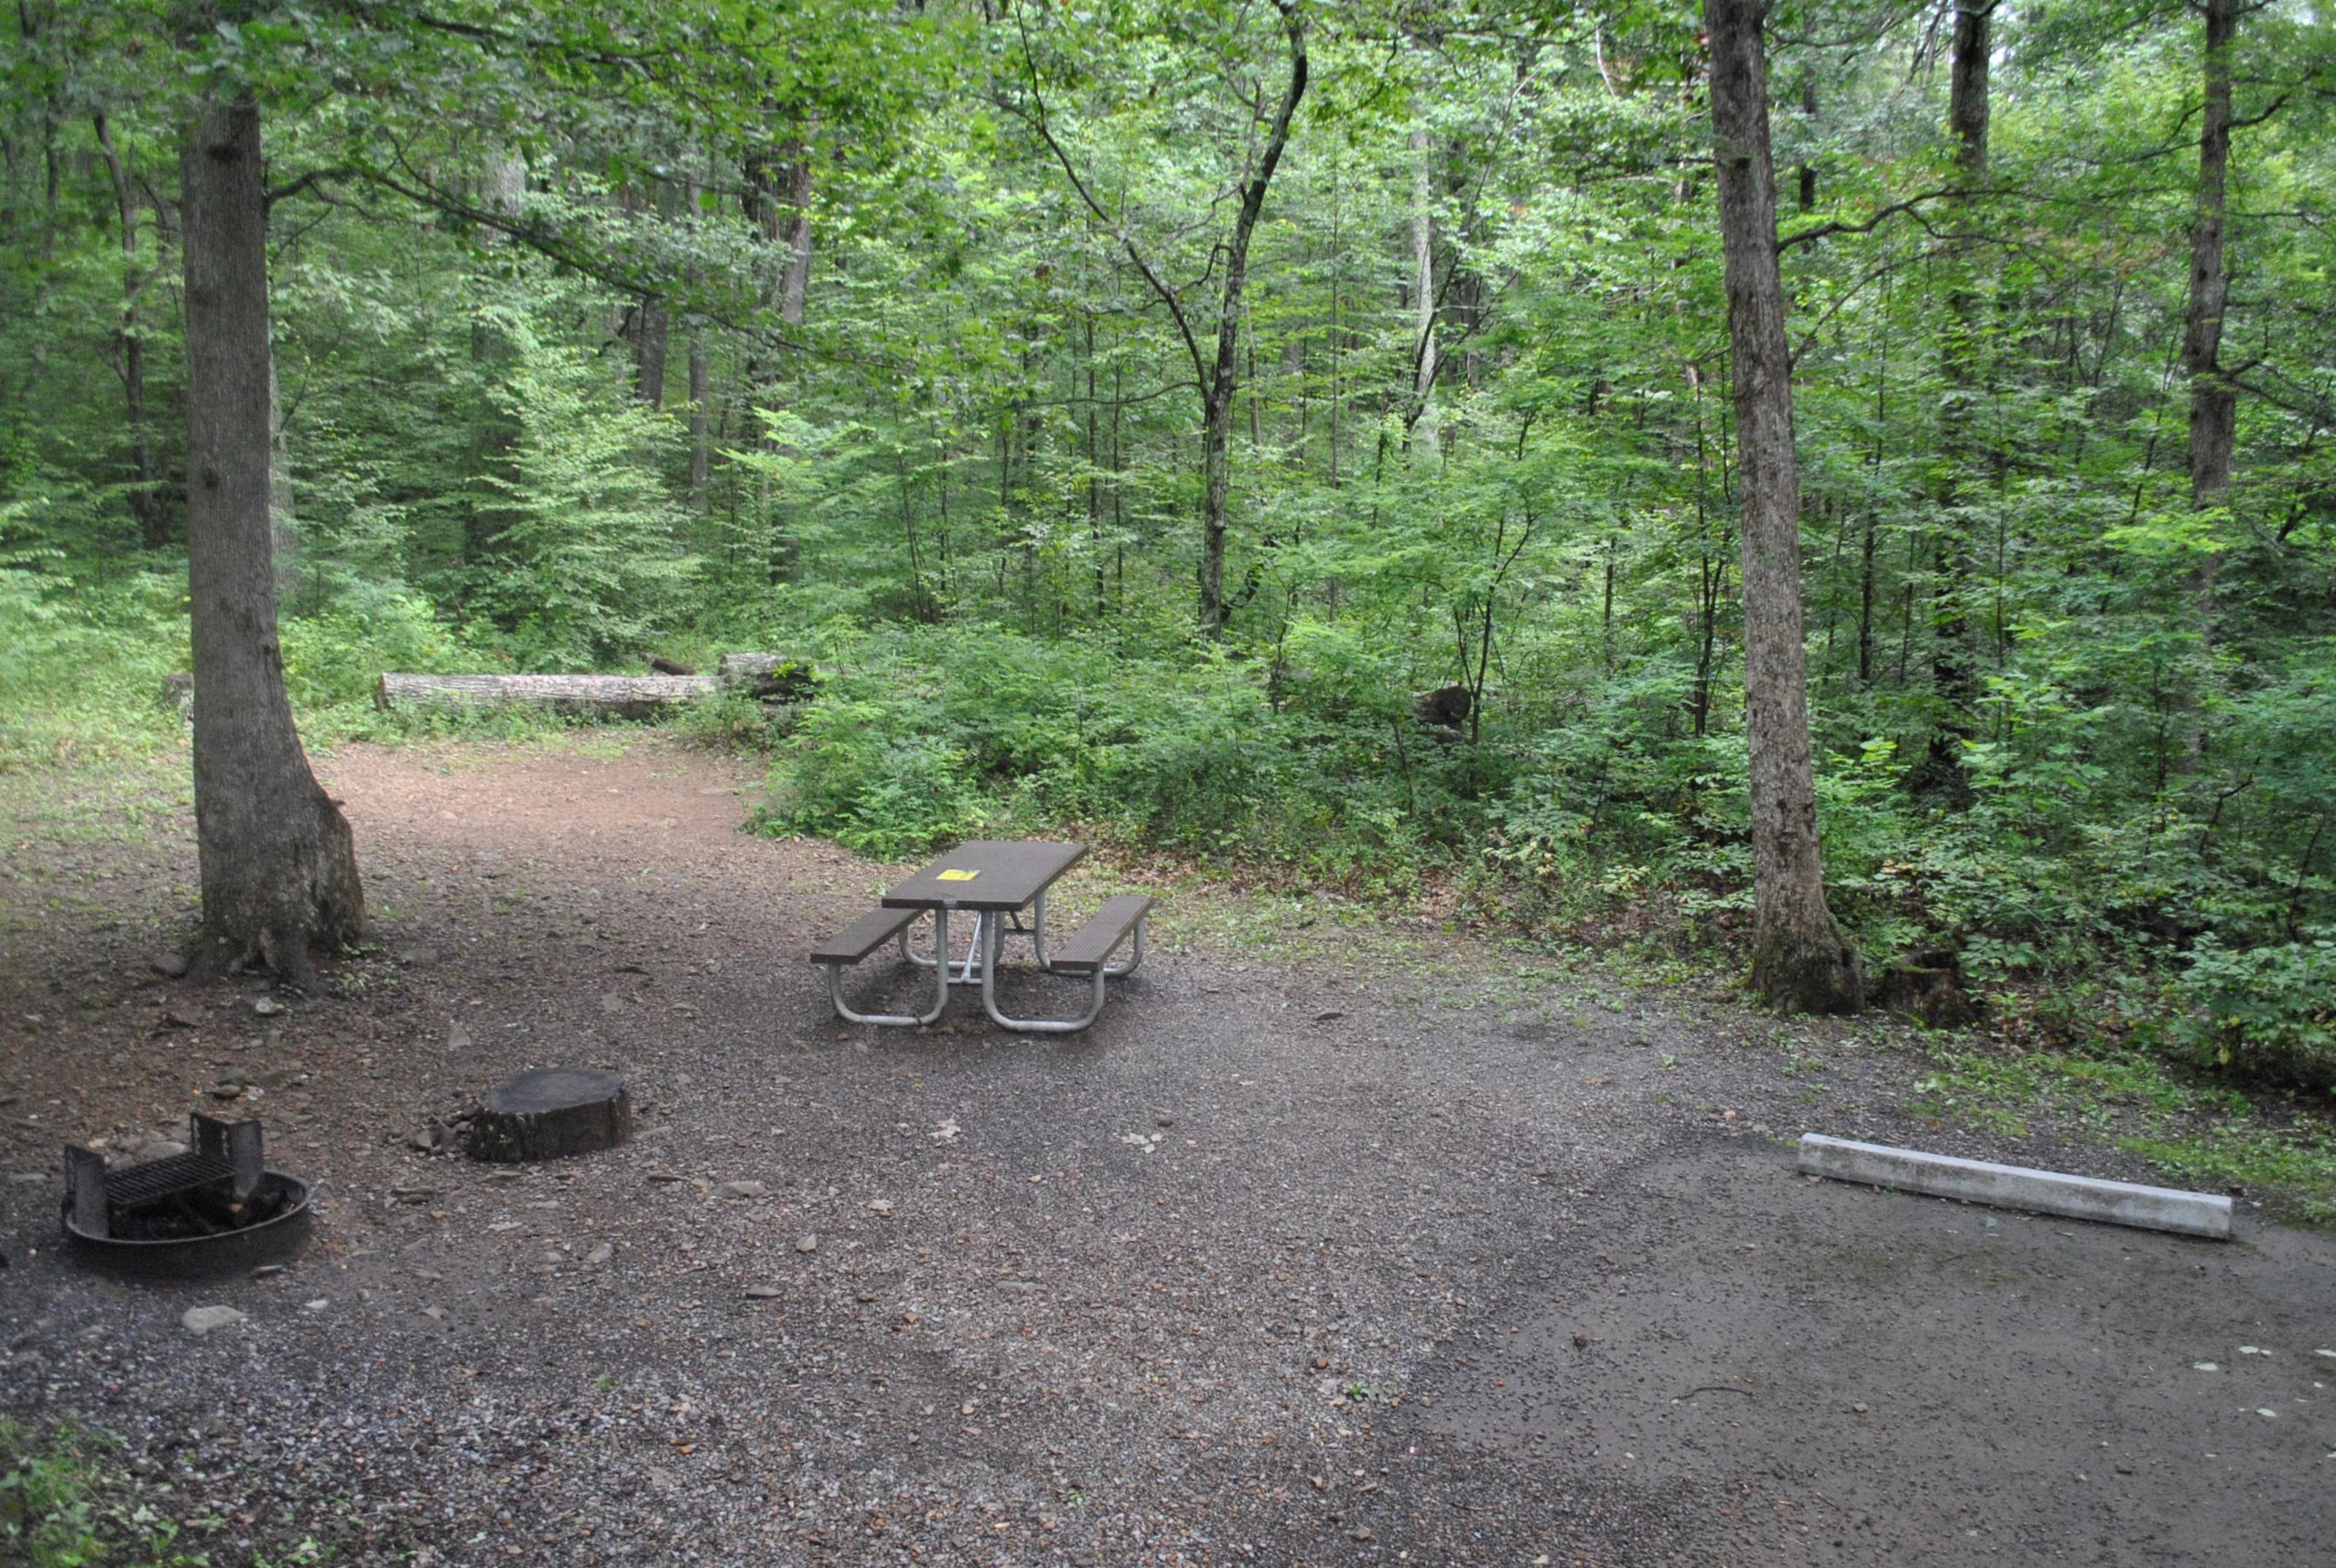 Mathews Arm Campground – Site A007